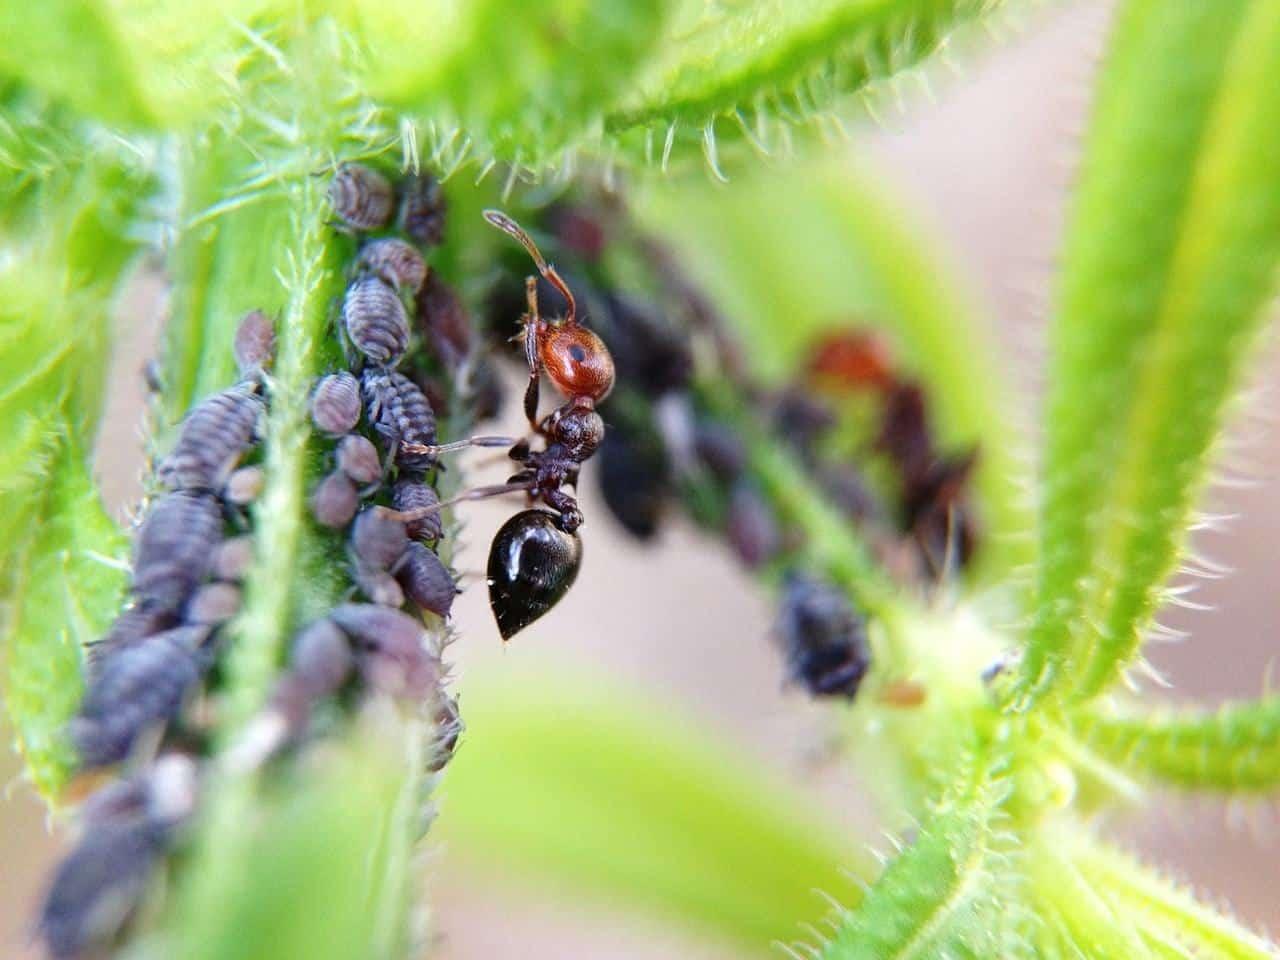 Fourmis se nourrissant de miellat de pucerons